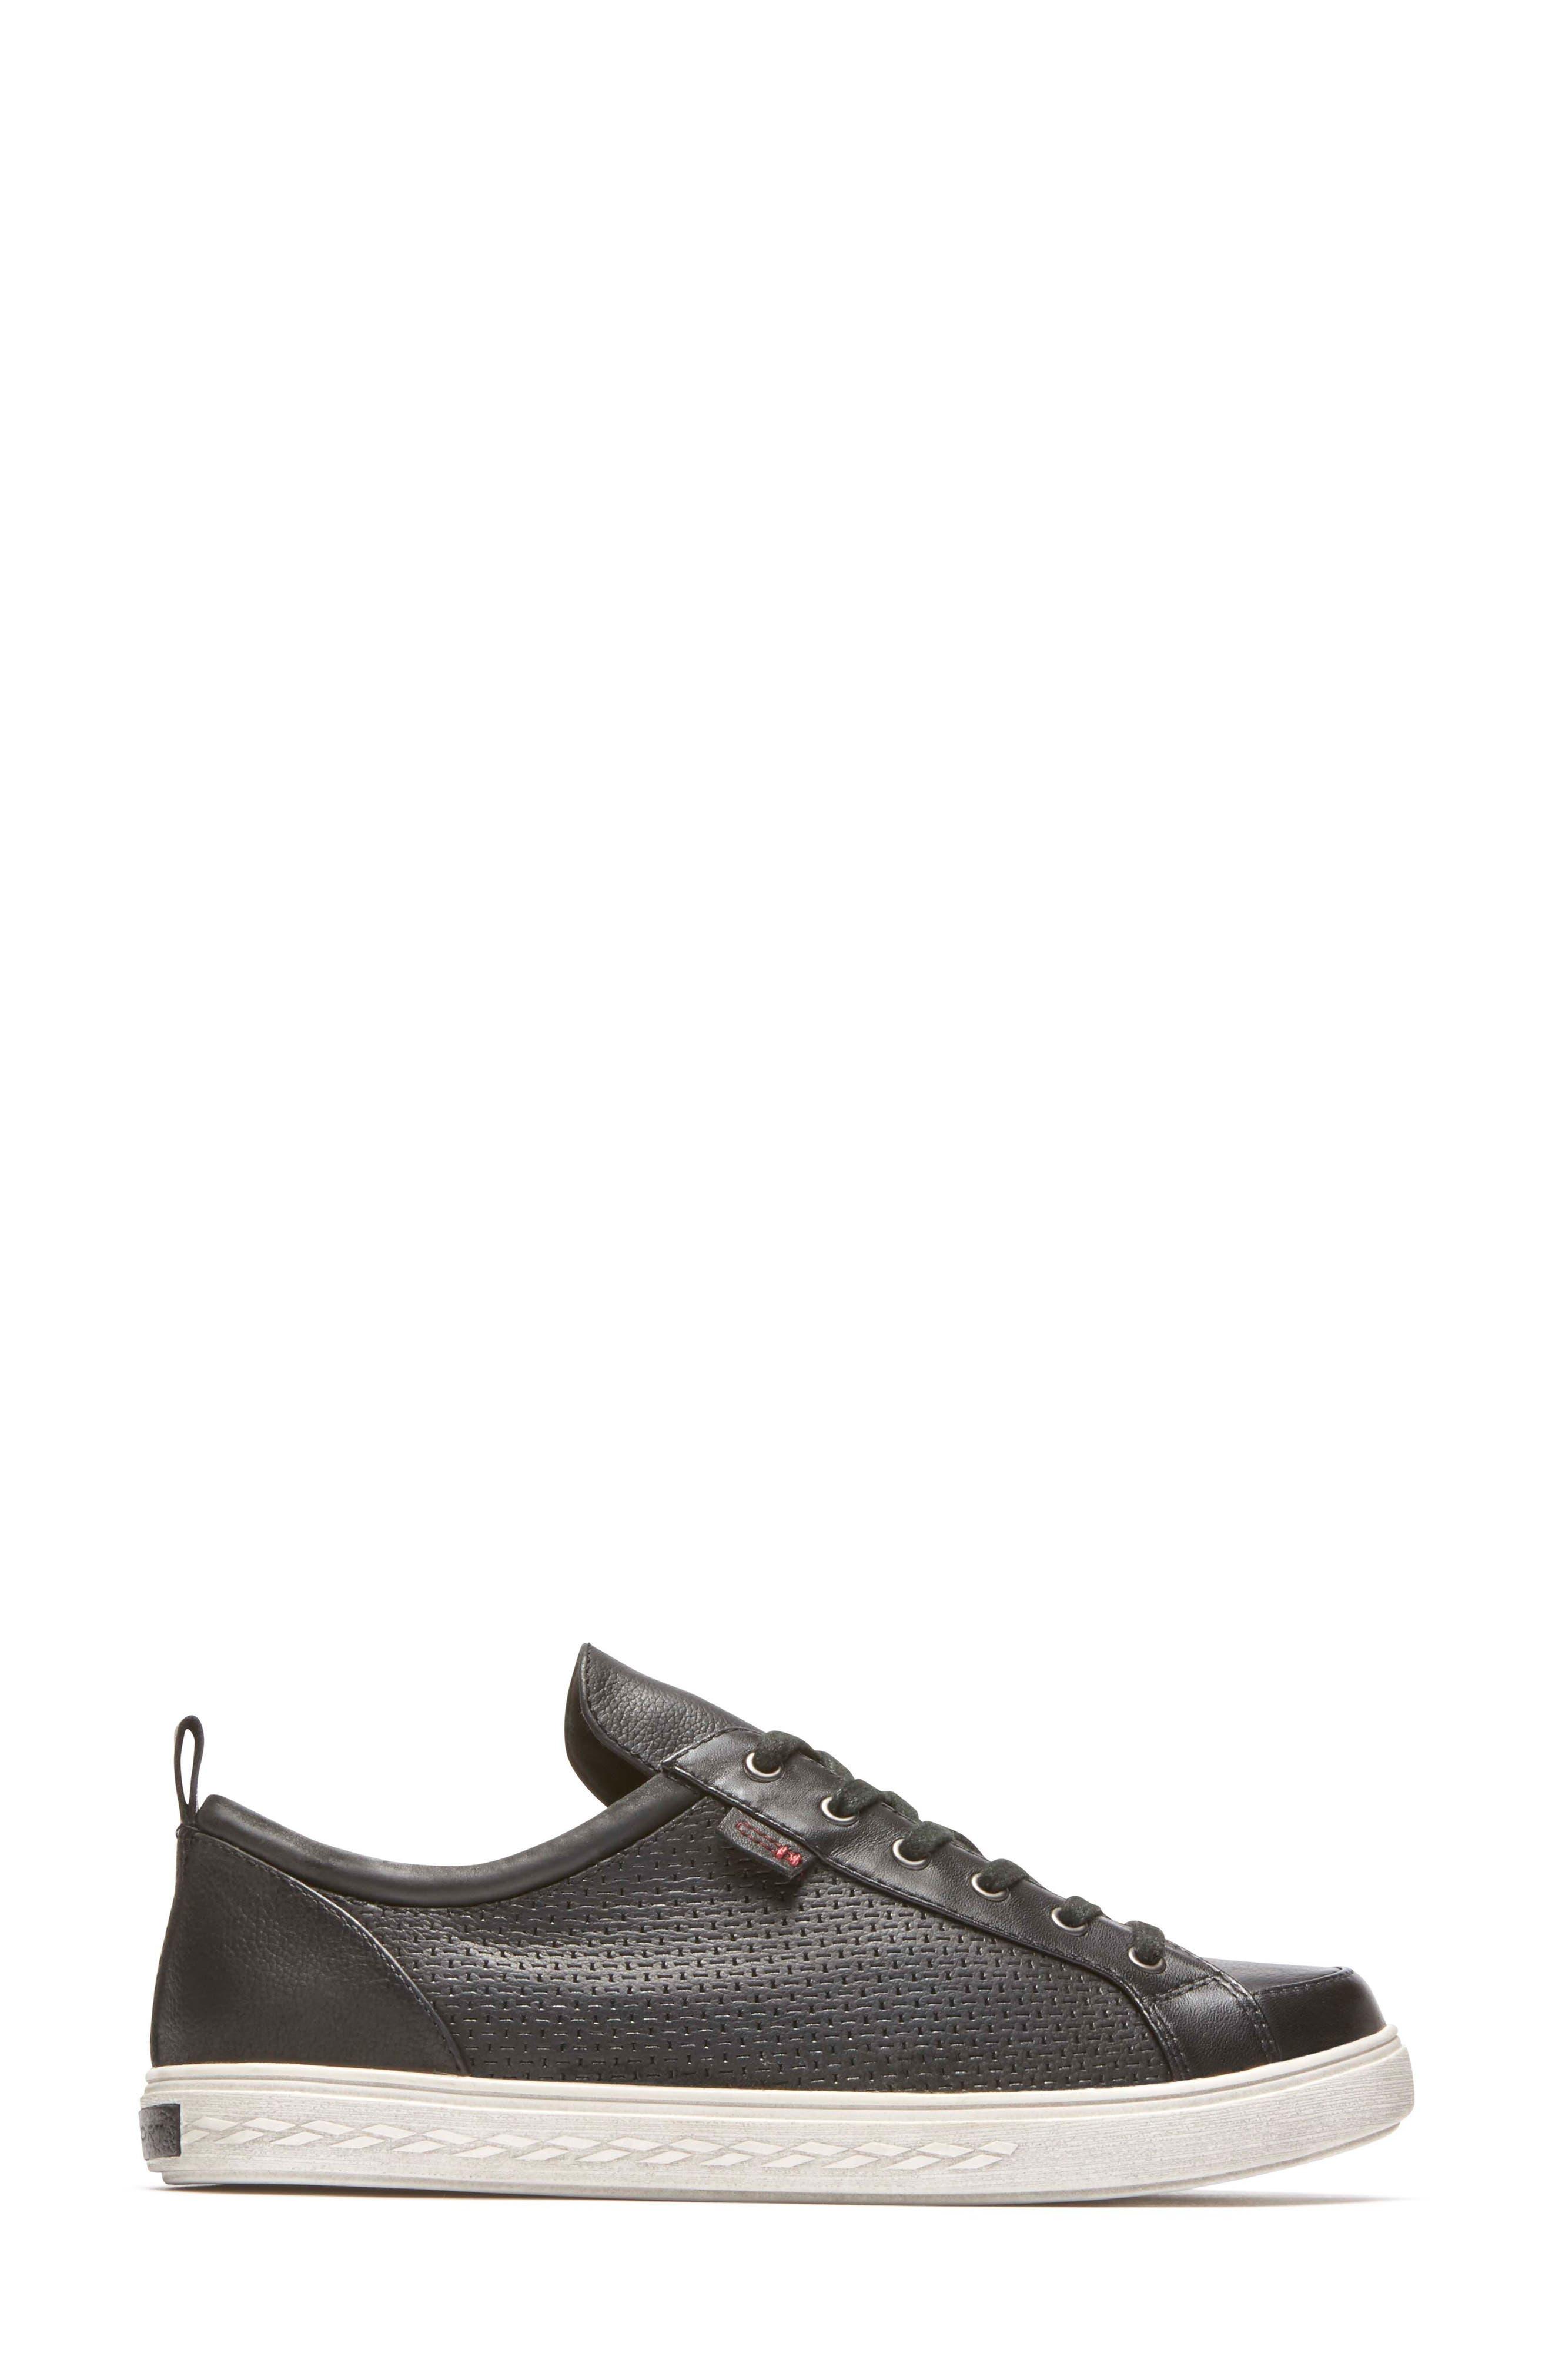 Willa Sneaker,                             Alternate thumbnail 3, color,                             BLACK LEATHER